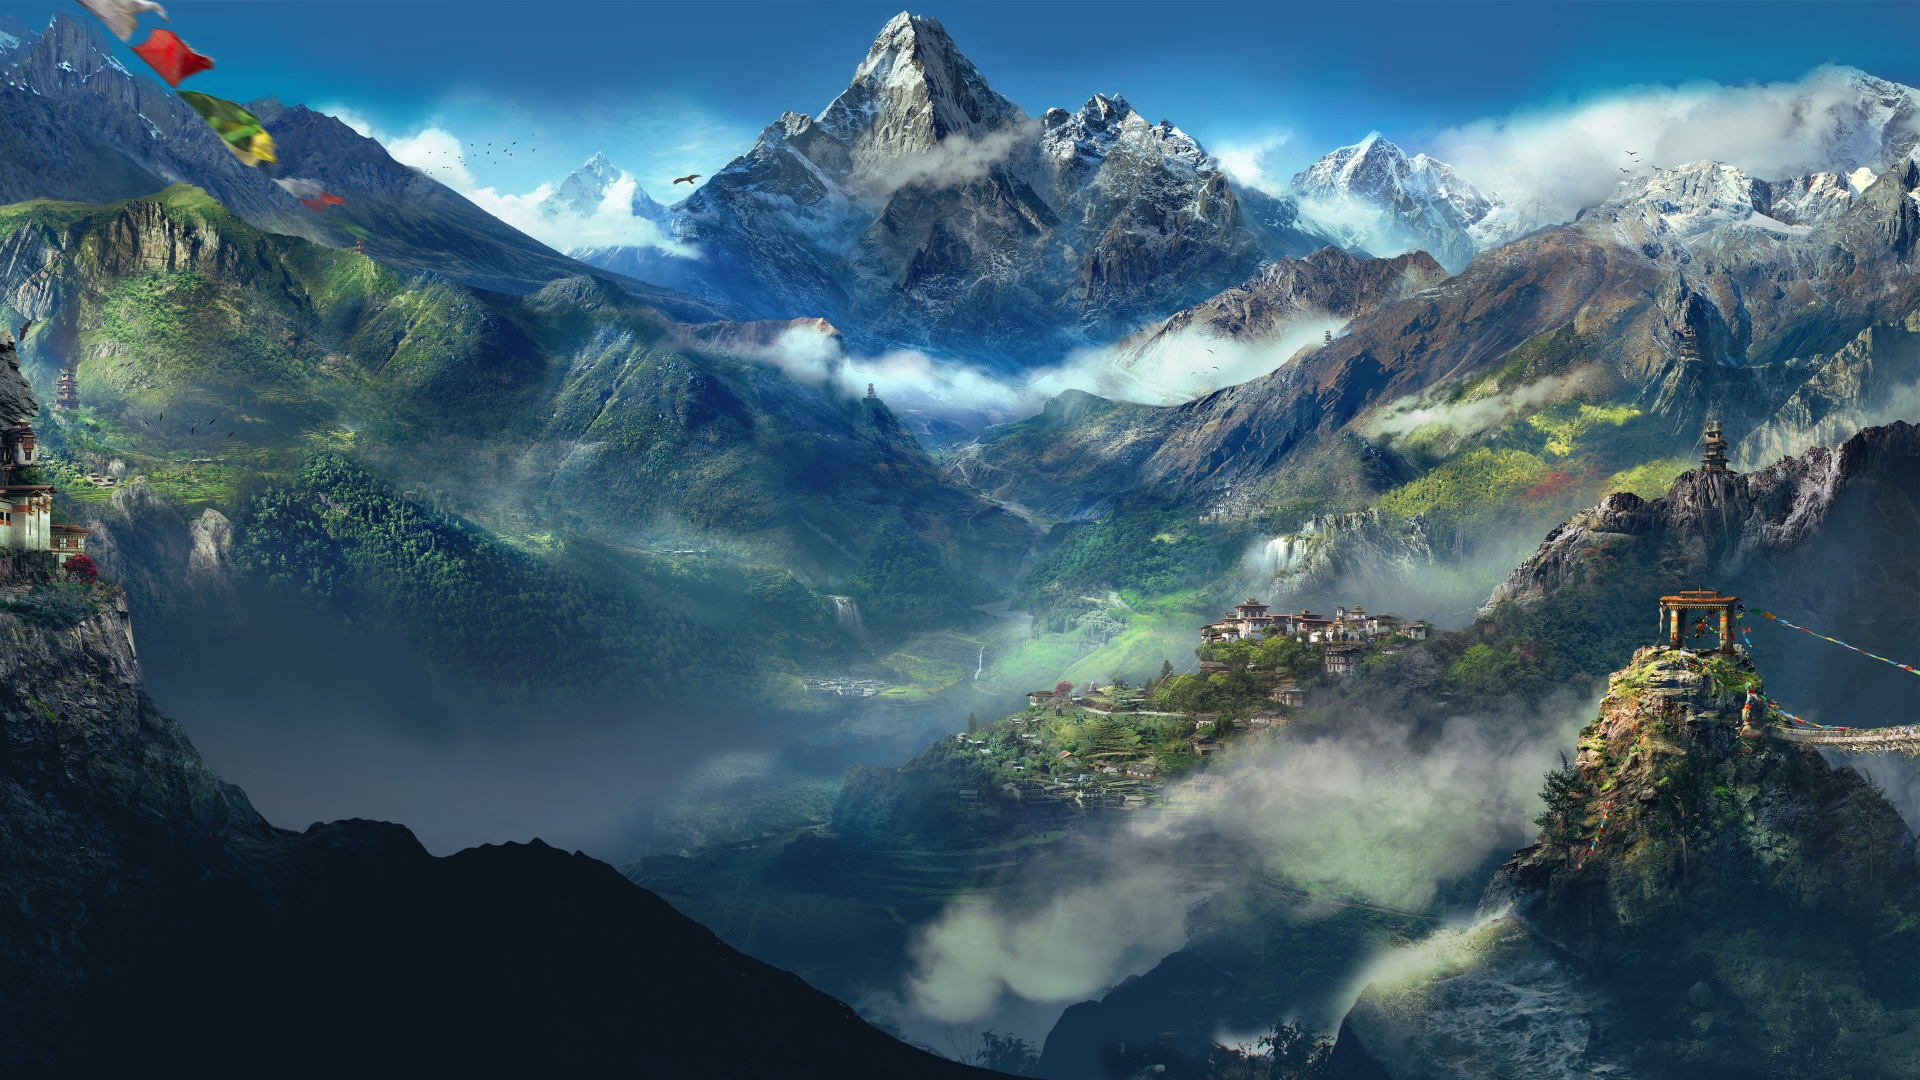 HD Himalaya Wallpaper 1920x1080